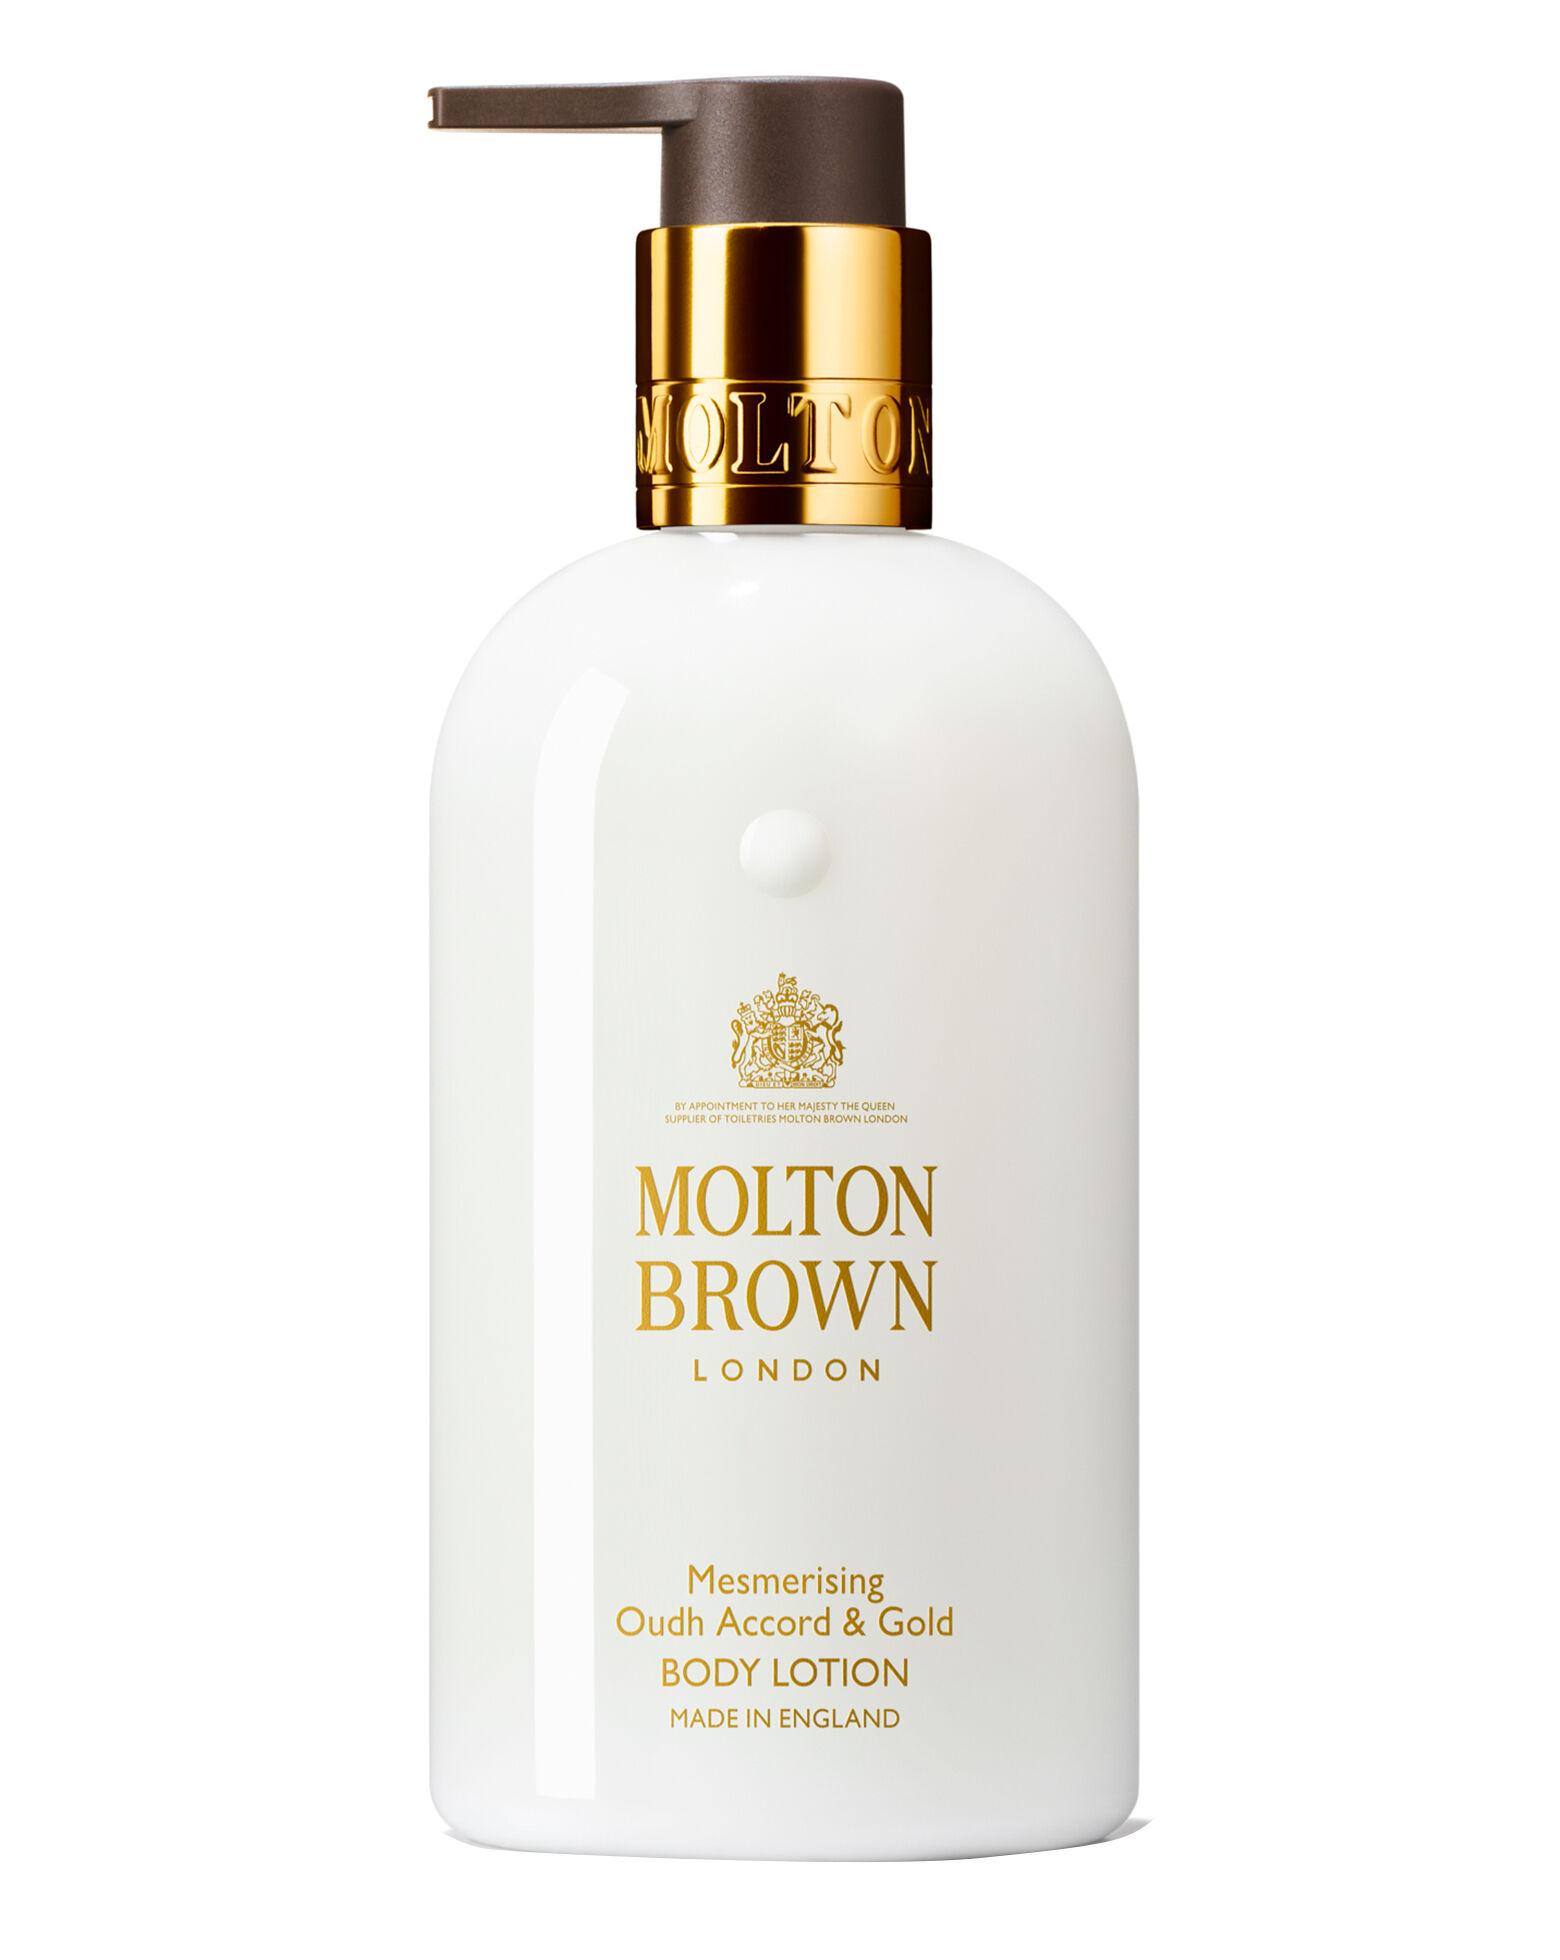 MOLTON BROWN - Mesmerising Ouadh Accord & Gold Body Lotion